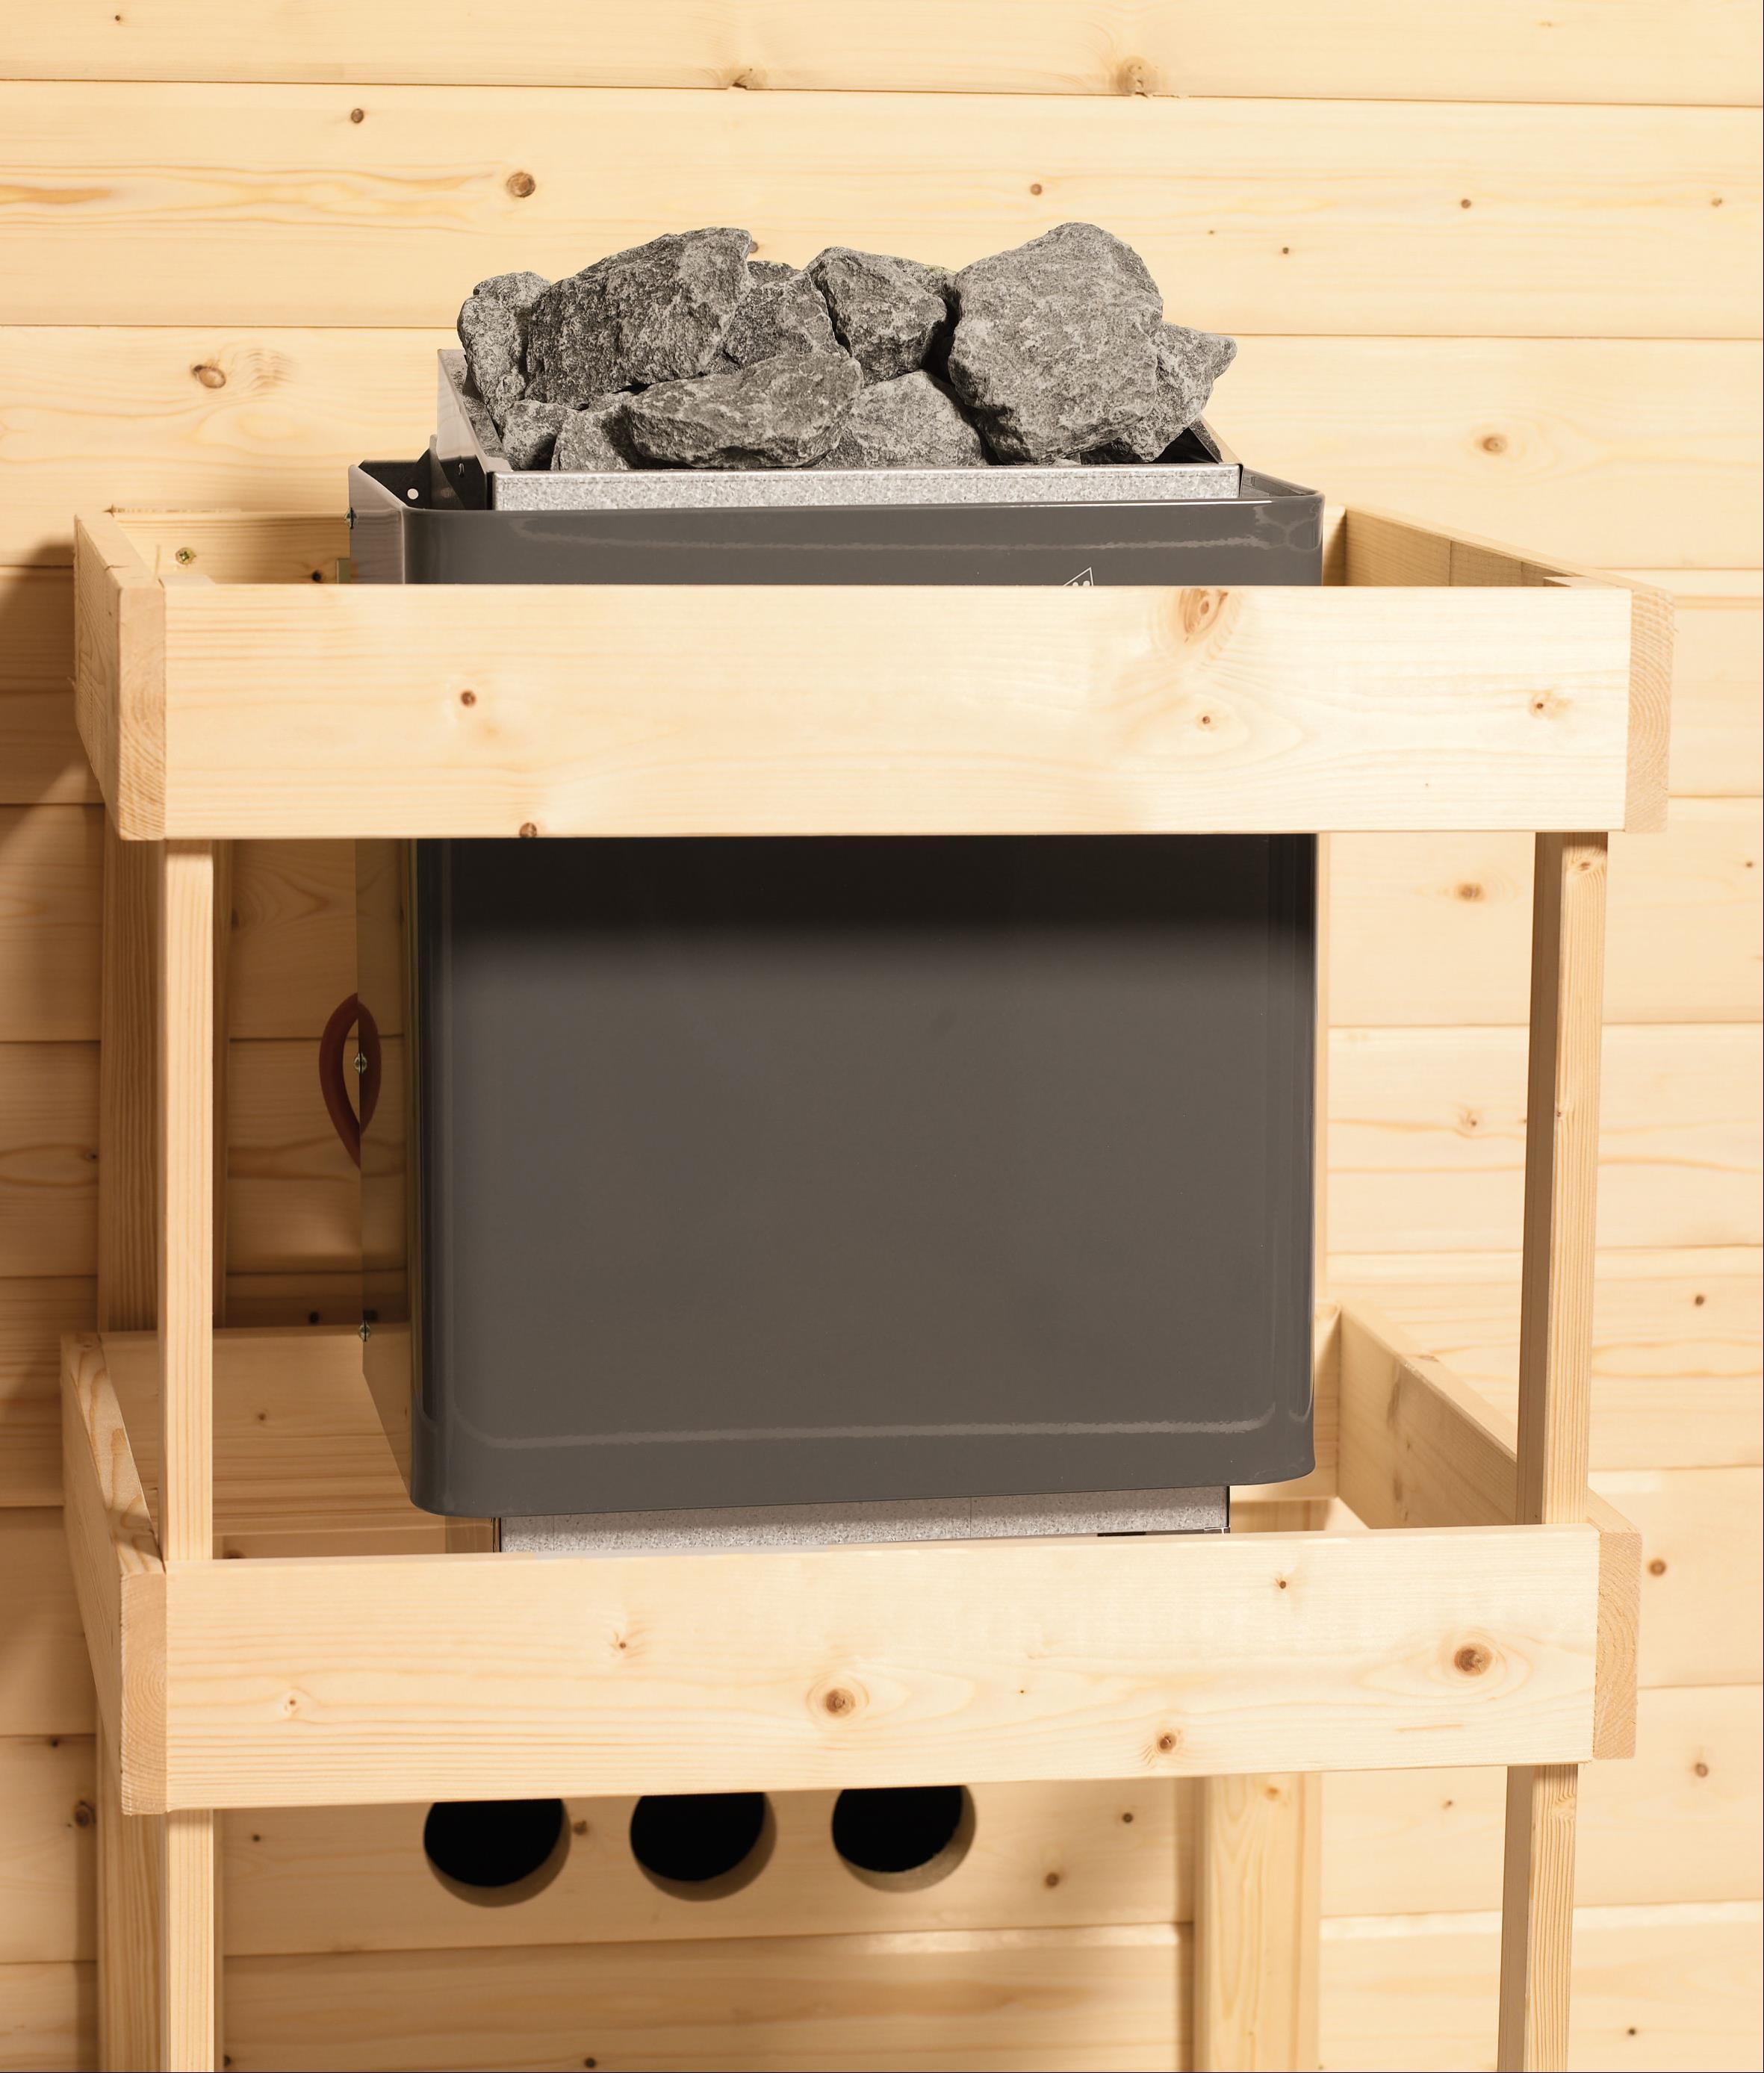 Woodfeeling Sauna Leona 38mm Kranz Ofen 9kW intern Tür Klarglas Bild 8